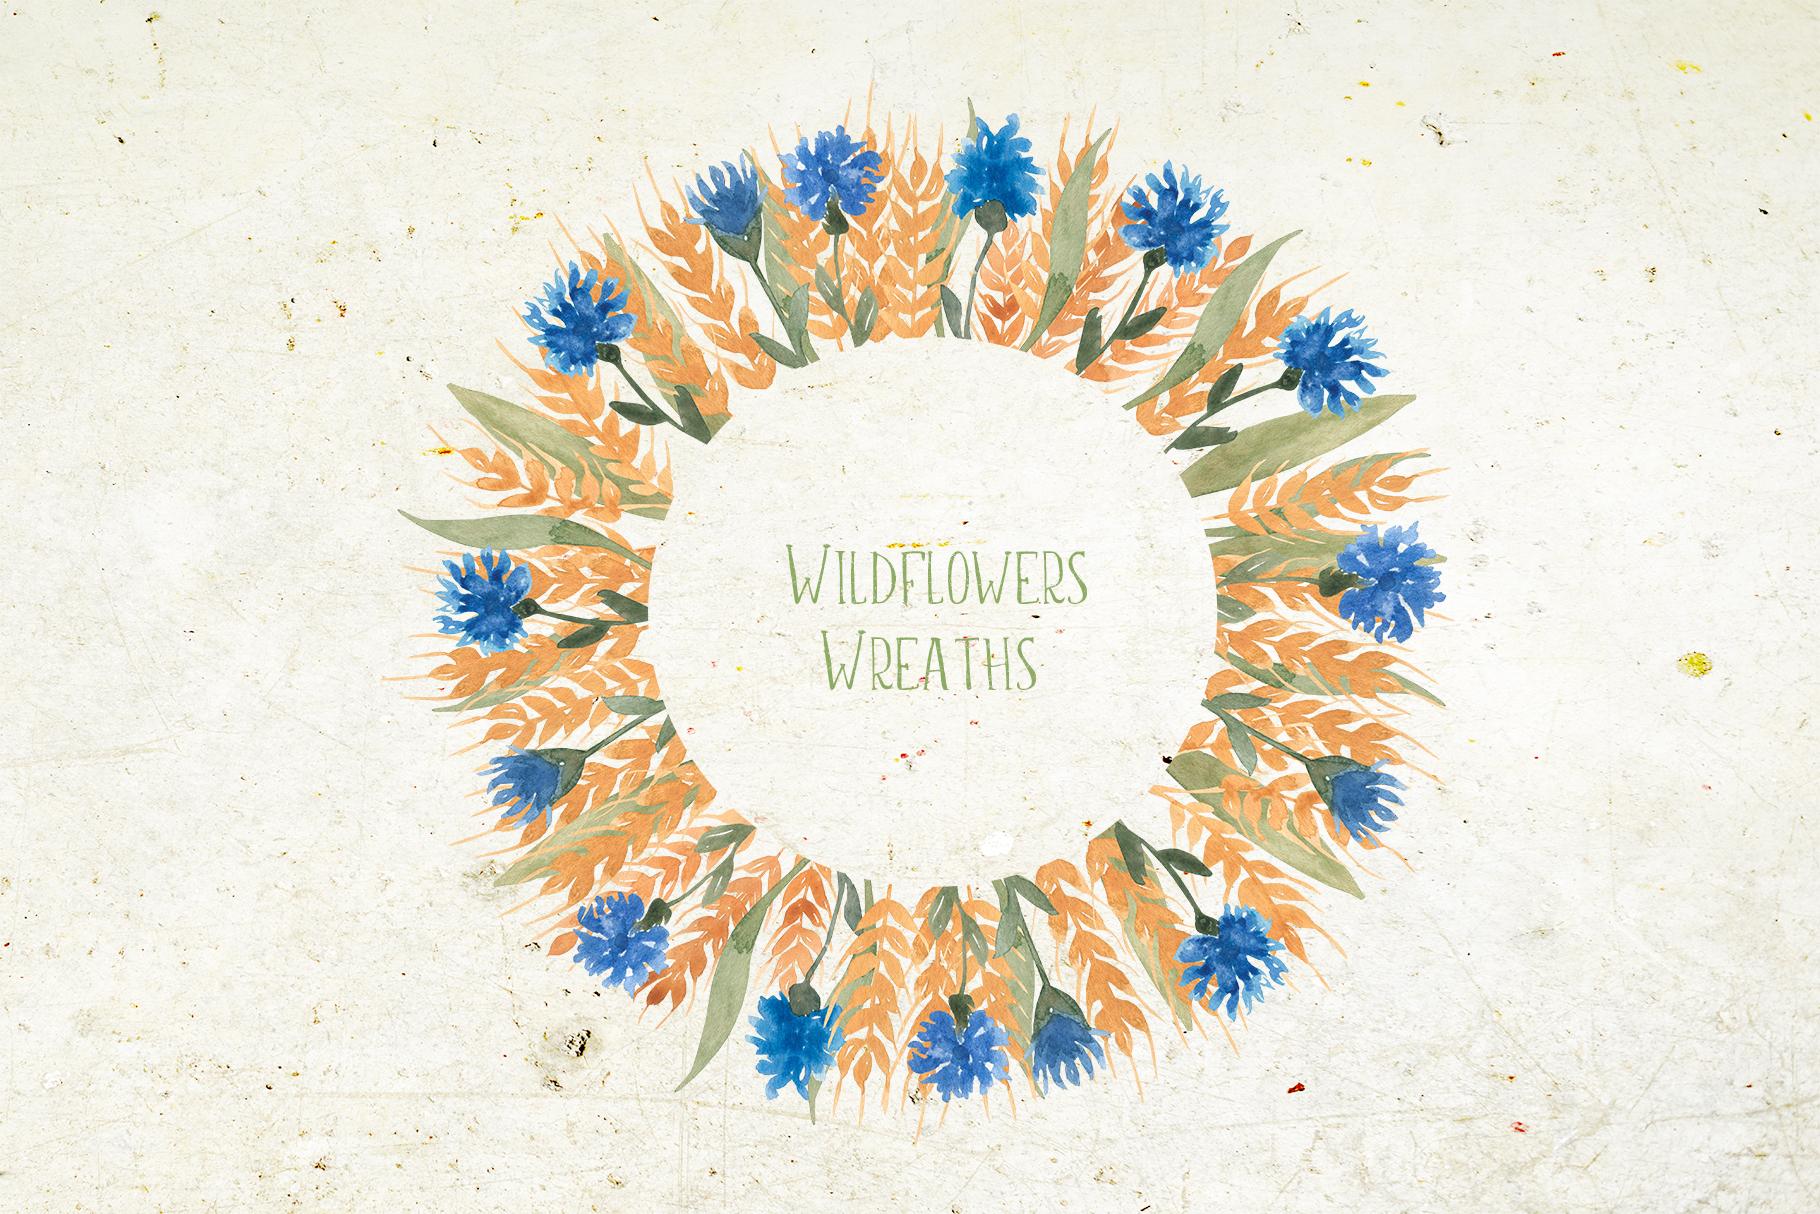 Wildflowers wreaths example image 1